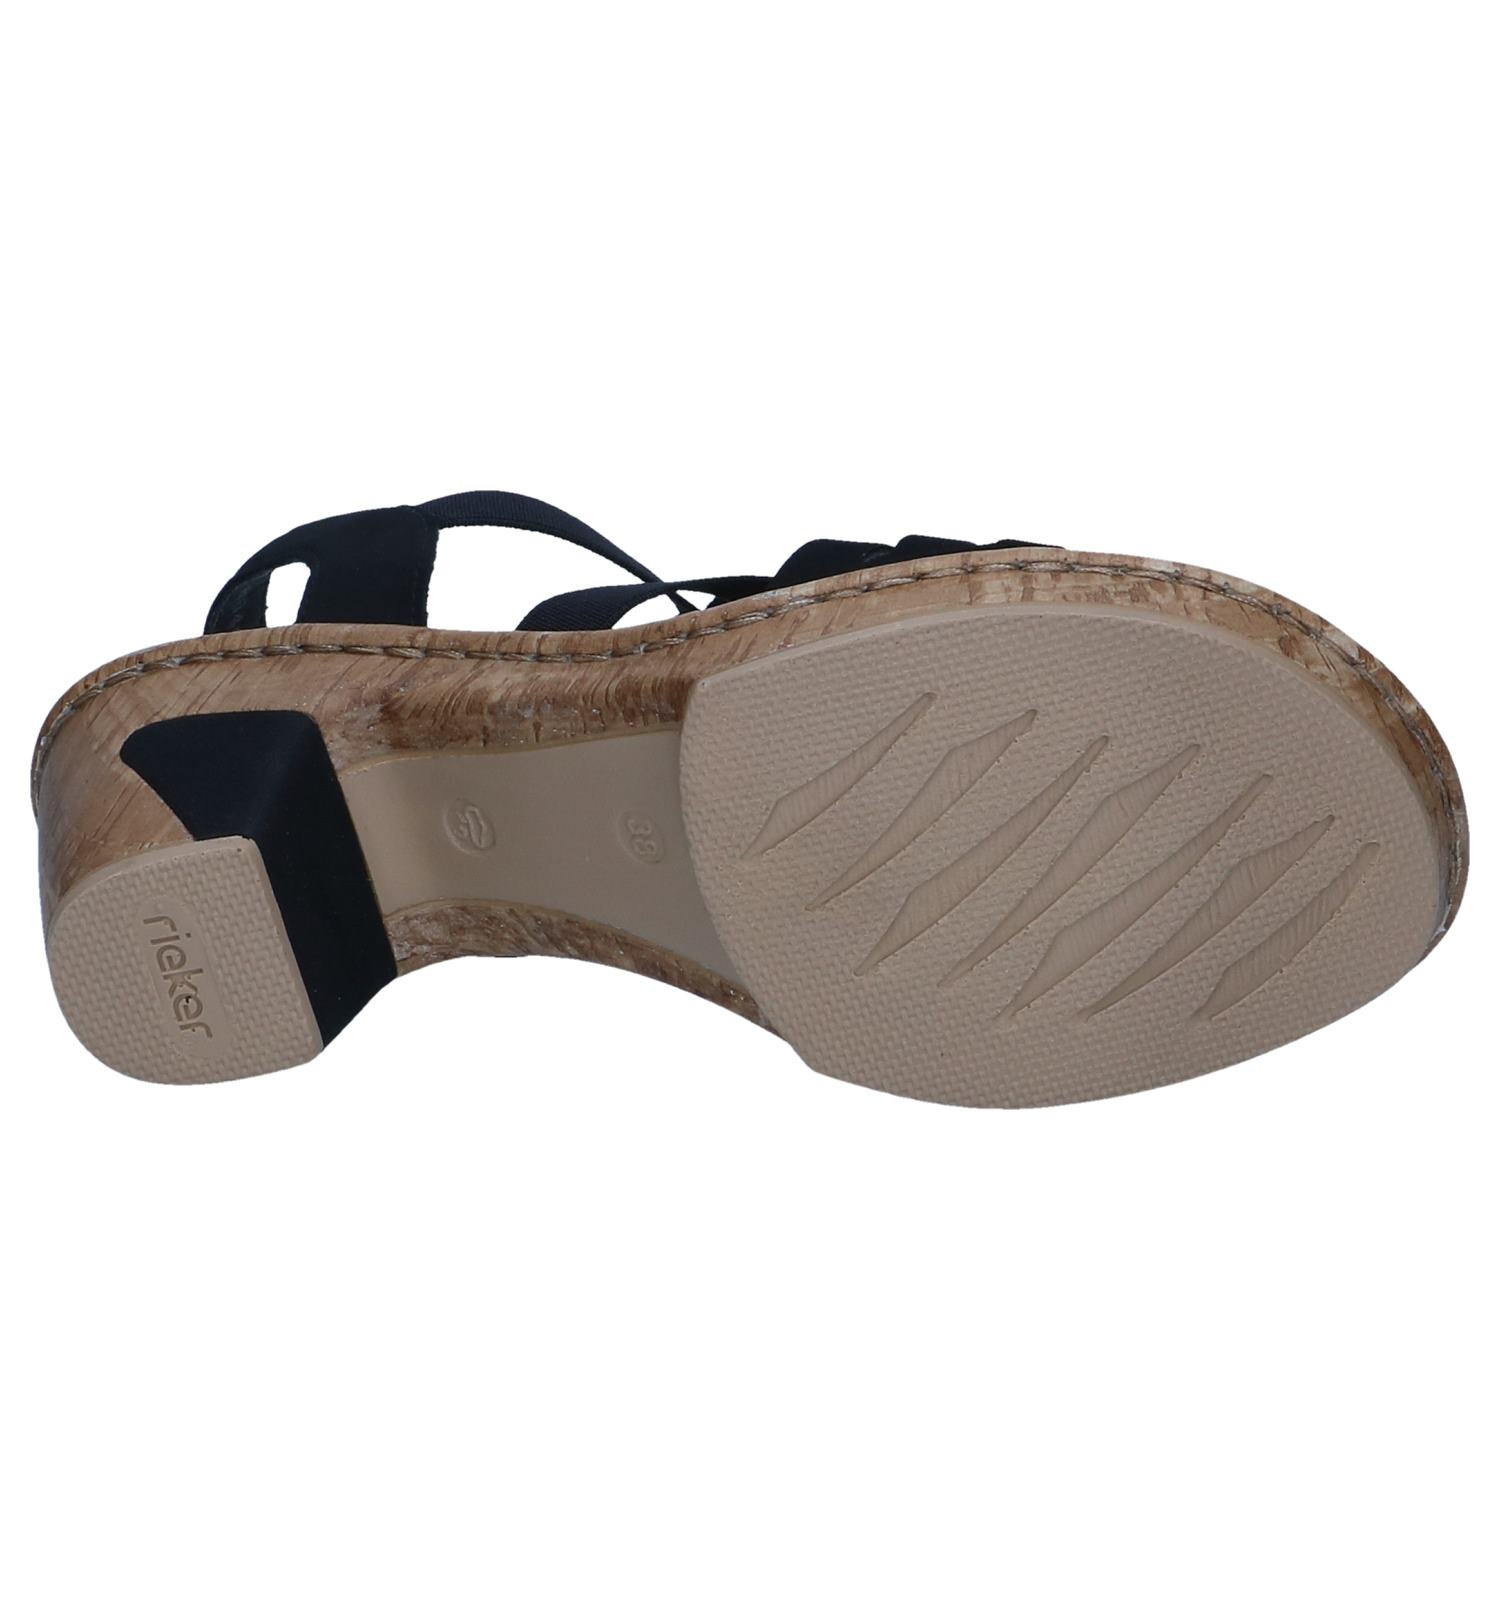 Sandalen Rieker Zwarte Zwarte Zwarte Rieker Rieker Zwarte Sandalen Rieker Sandalen Sandalen QhxtCsBrd